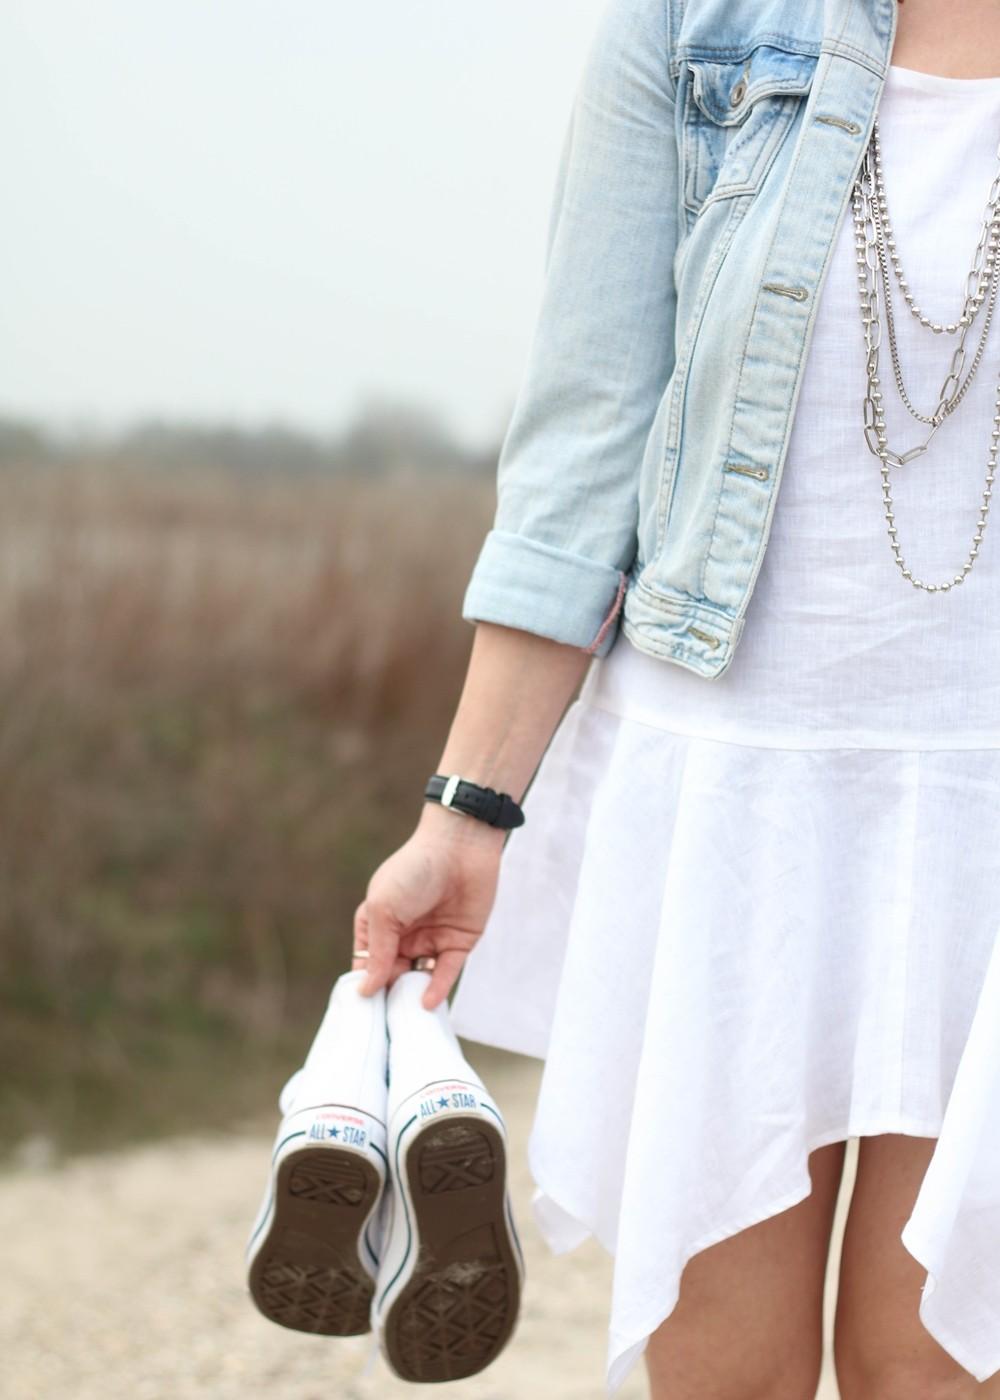 Fashionblogger Karlsruhe Outfit Strand weisses Kleid Jeansjacke Lederchucks (10)